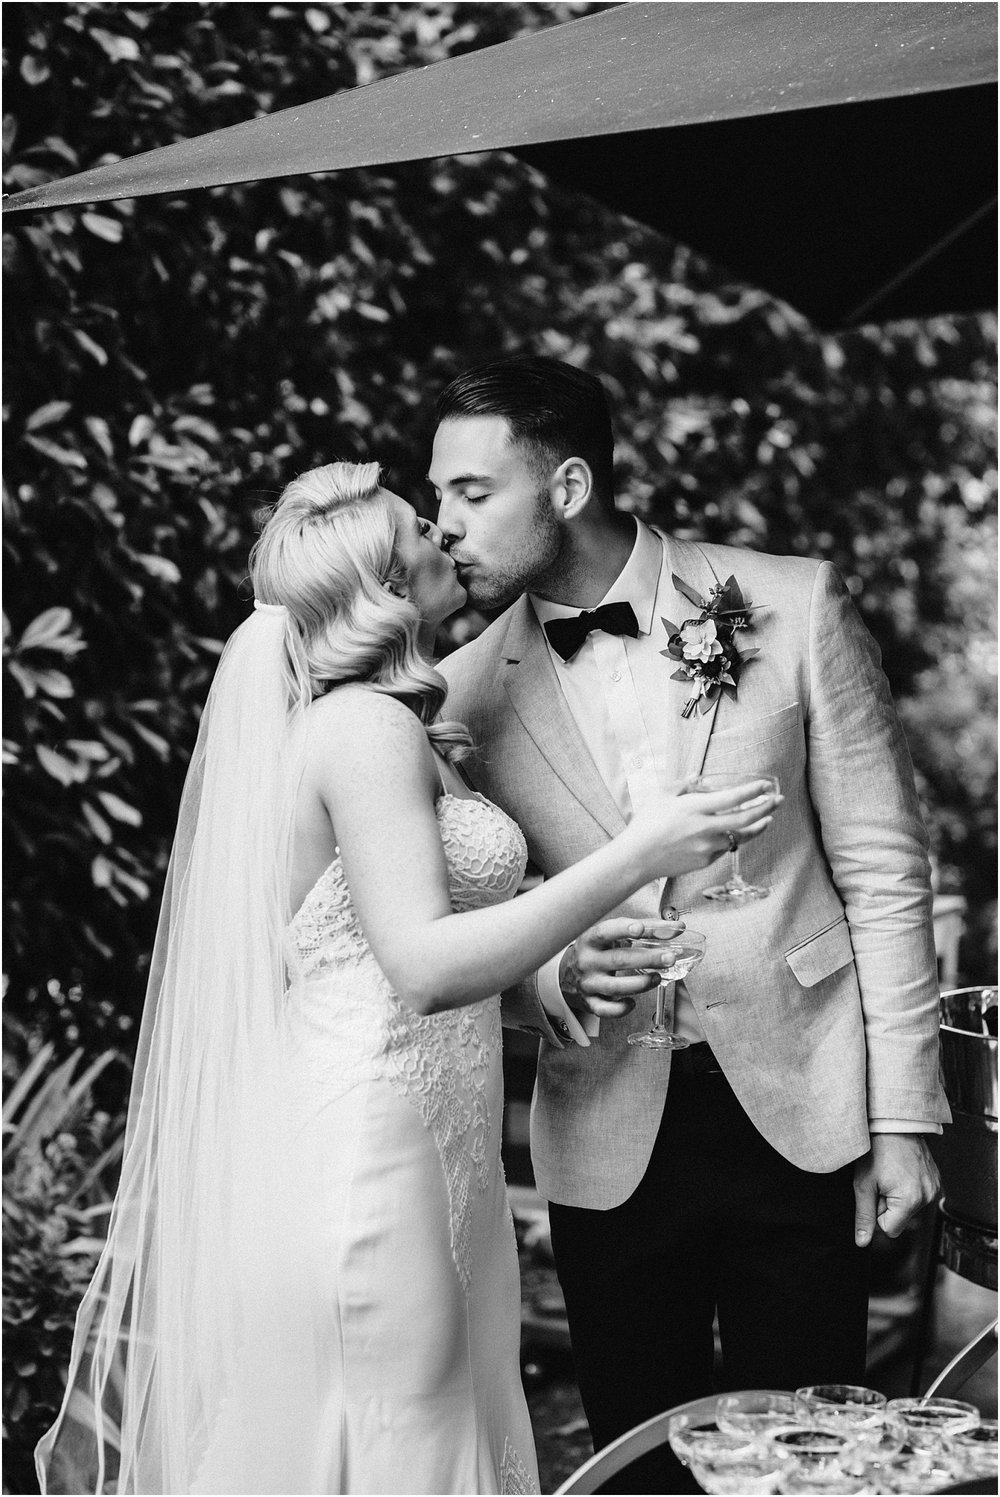 Katherine and Sam's stylish elopment at the Euroa Butter Factory._0055.jpg